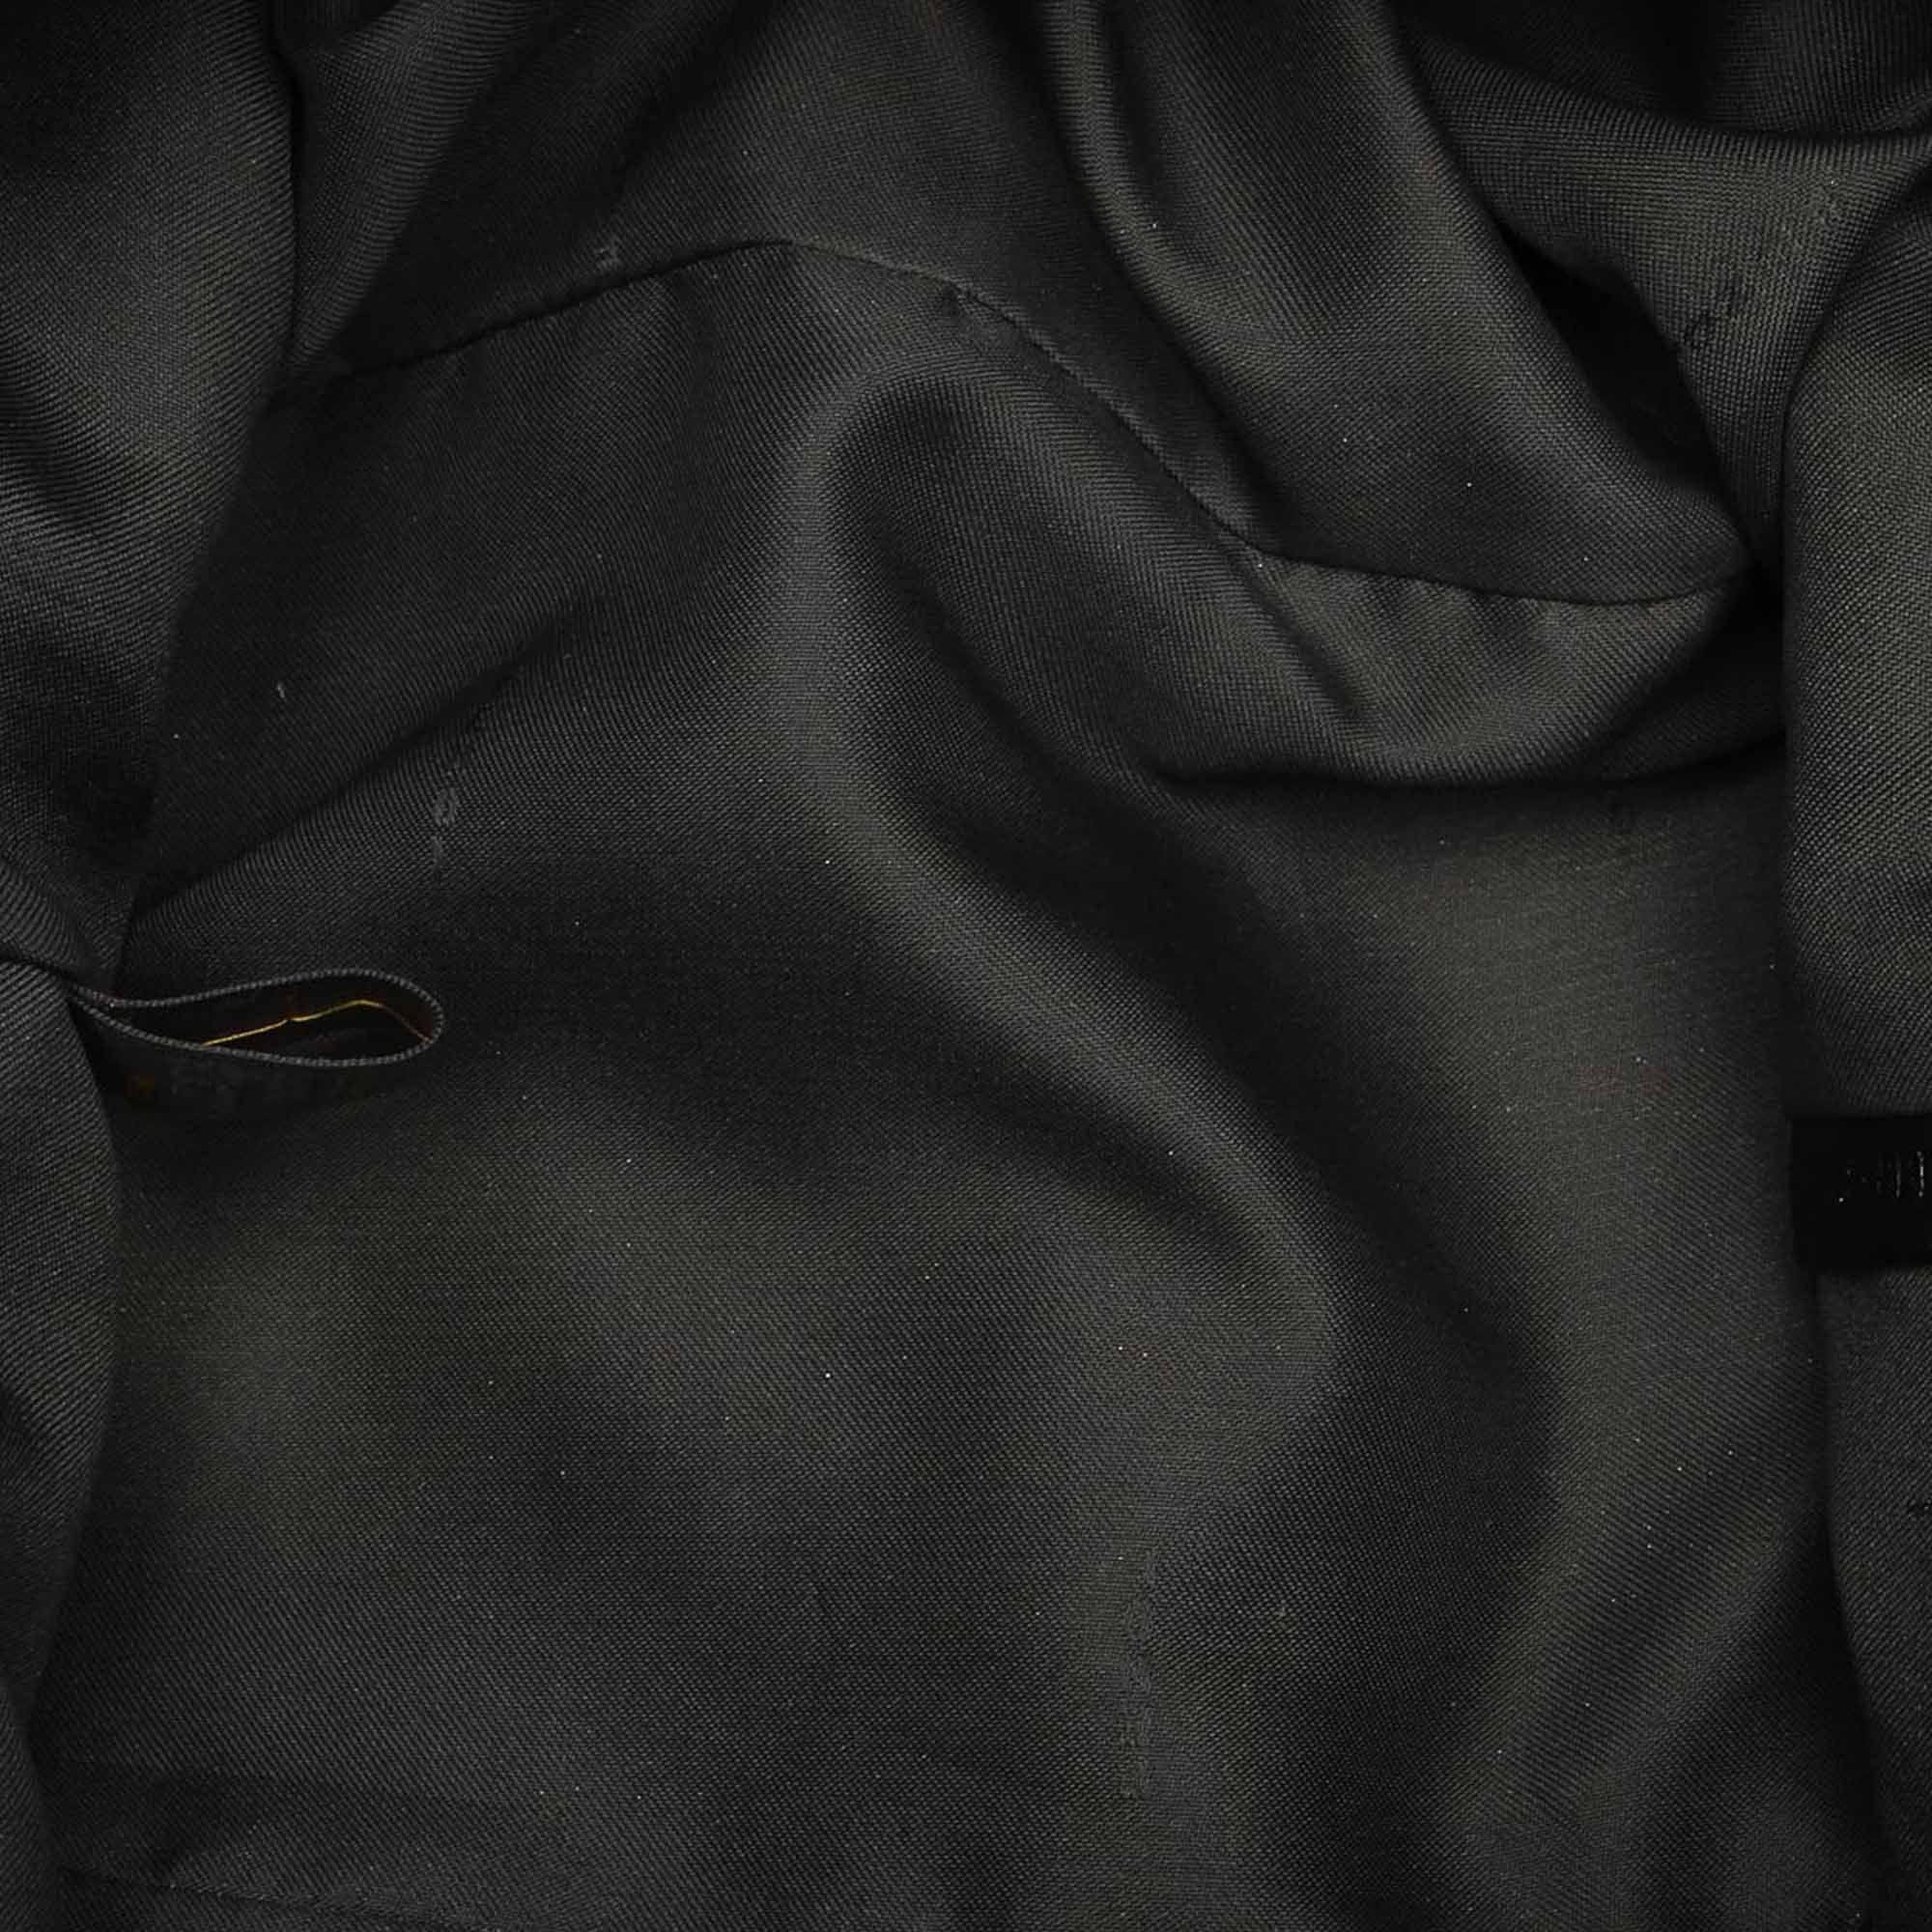 Vintage Fendi Tiger Print Canvas Tote Bag Black